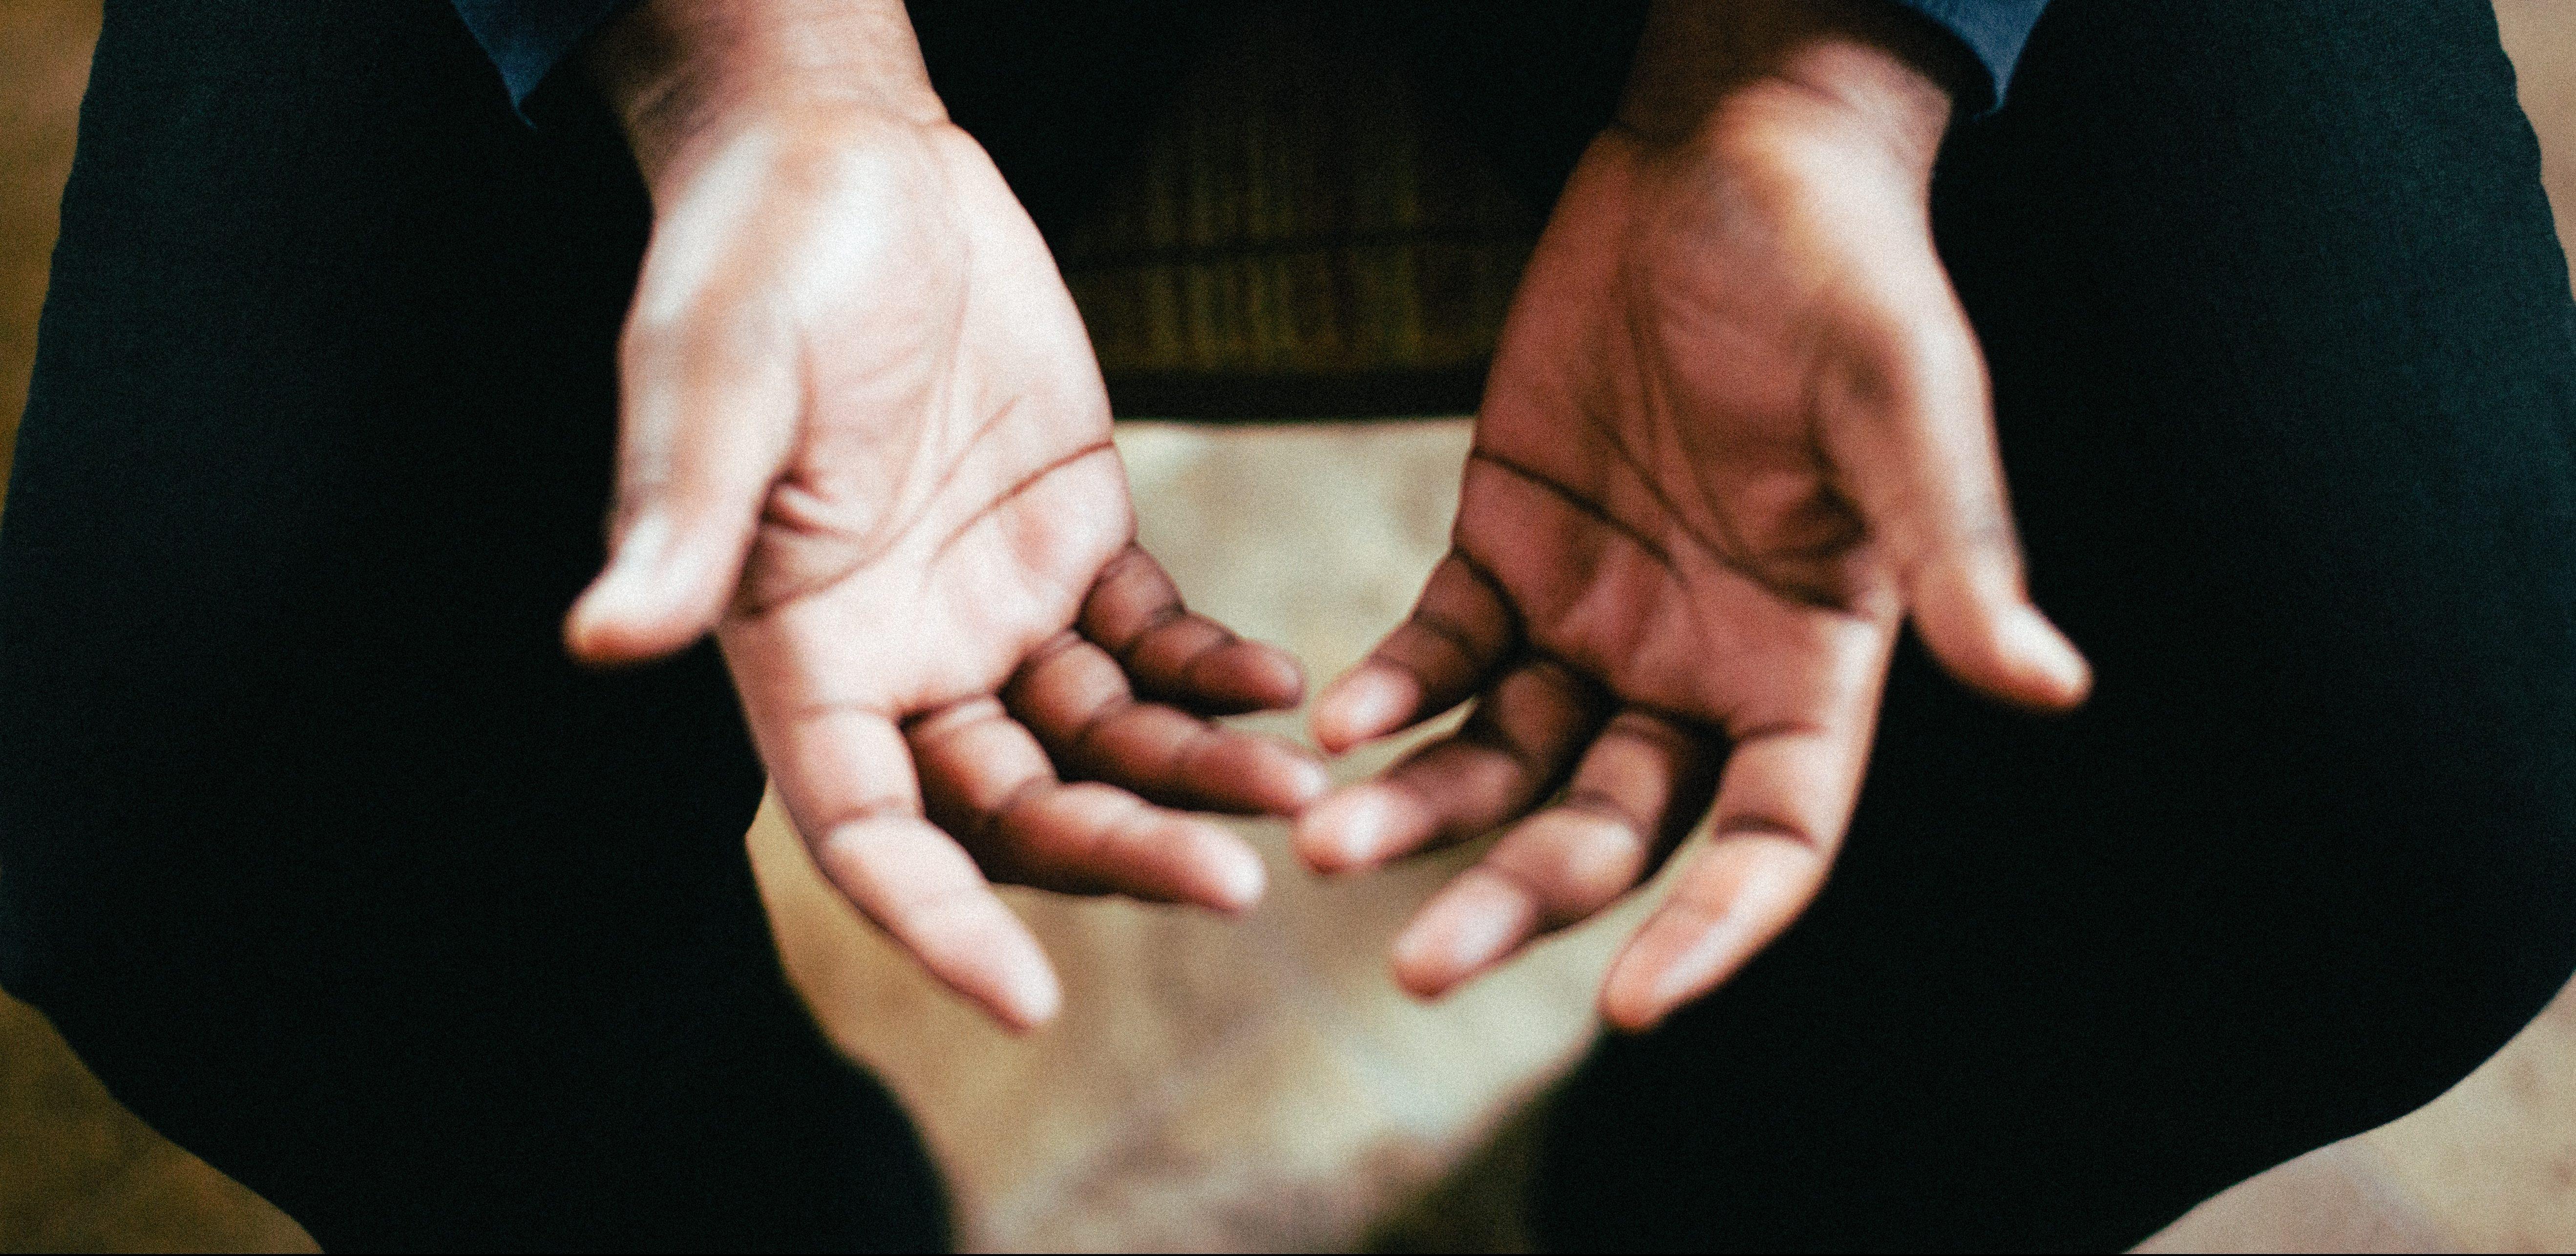 compassionate care ministry